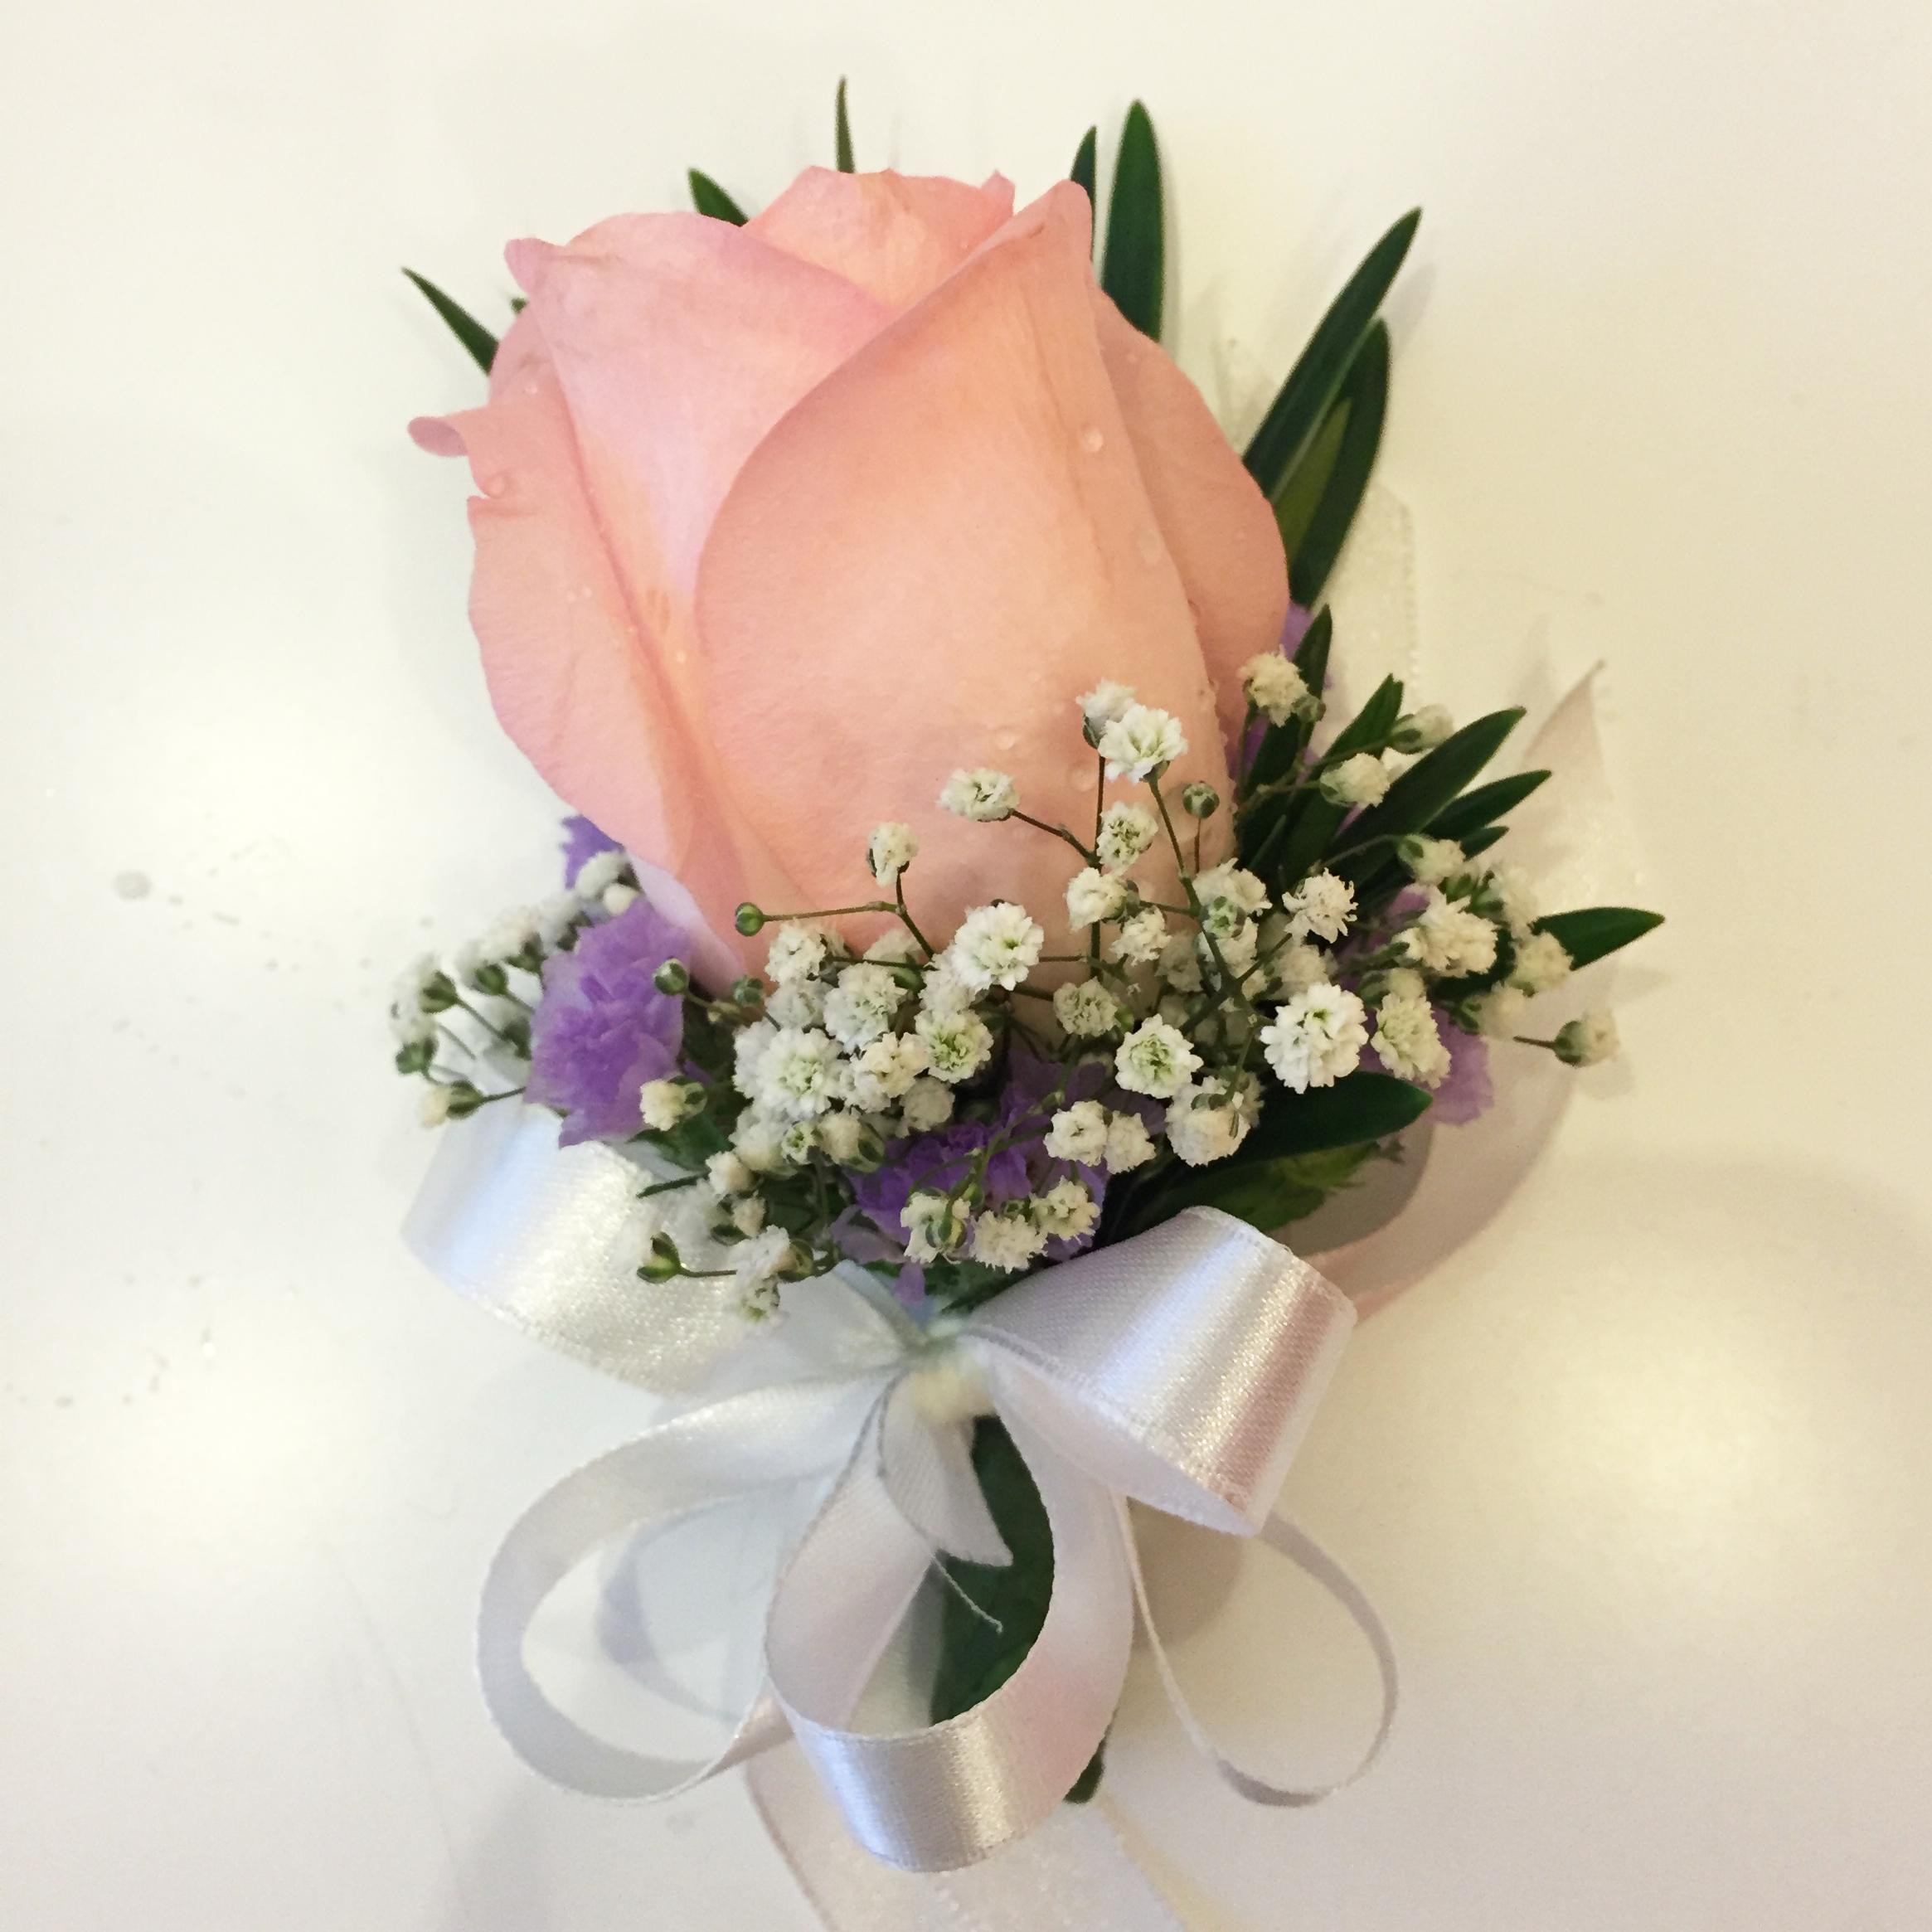 warmest flowers  wedding corsage, Natural flower